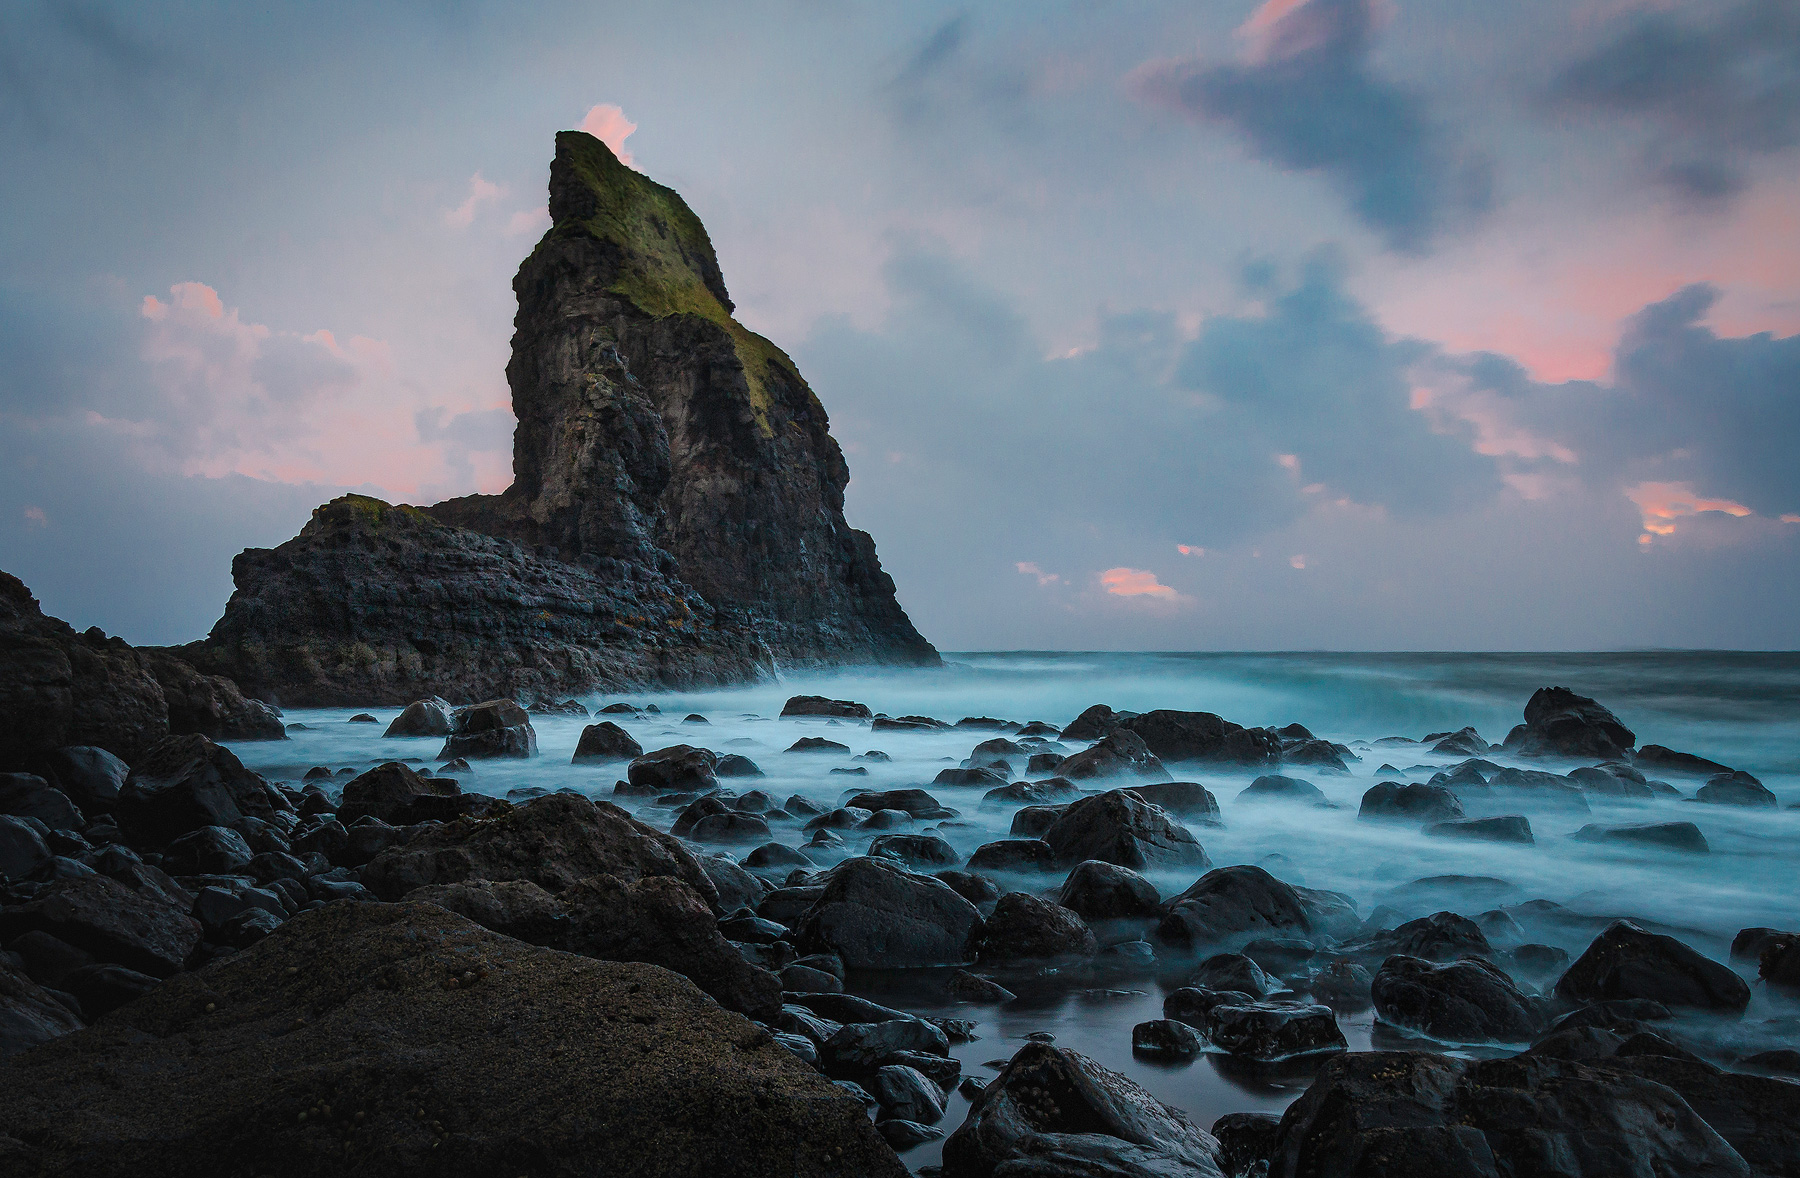 Jaworskyj Fotoreise, Lukas Voegelin, Schottland, Isle of Skye, Langzeitbelichtung, Talisker Bay, Sonnenuntergang